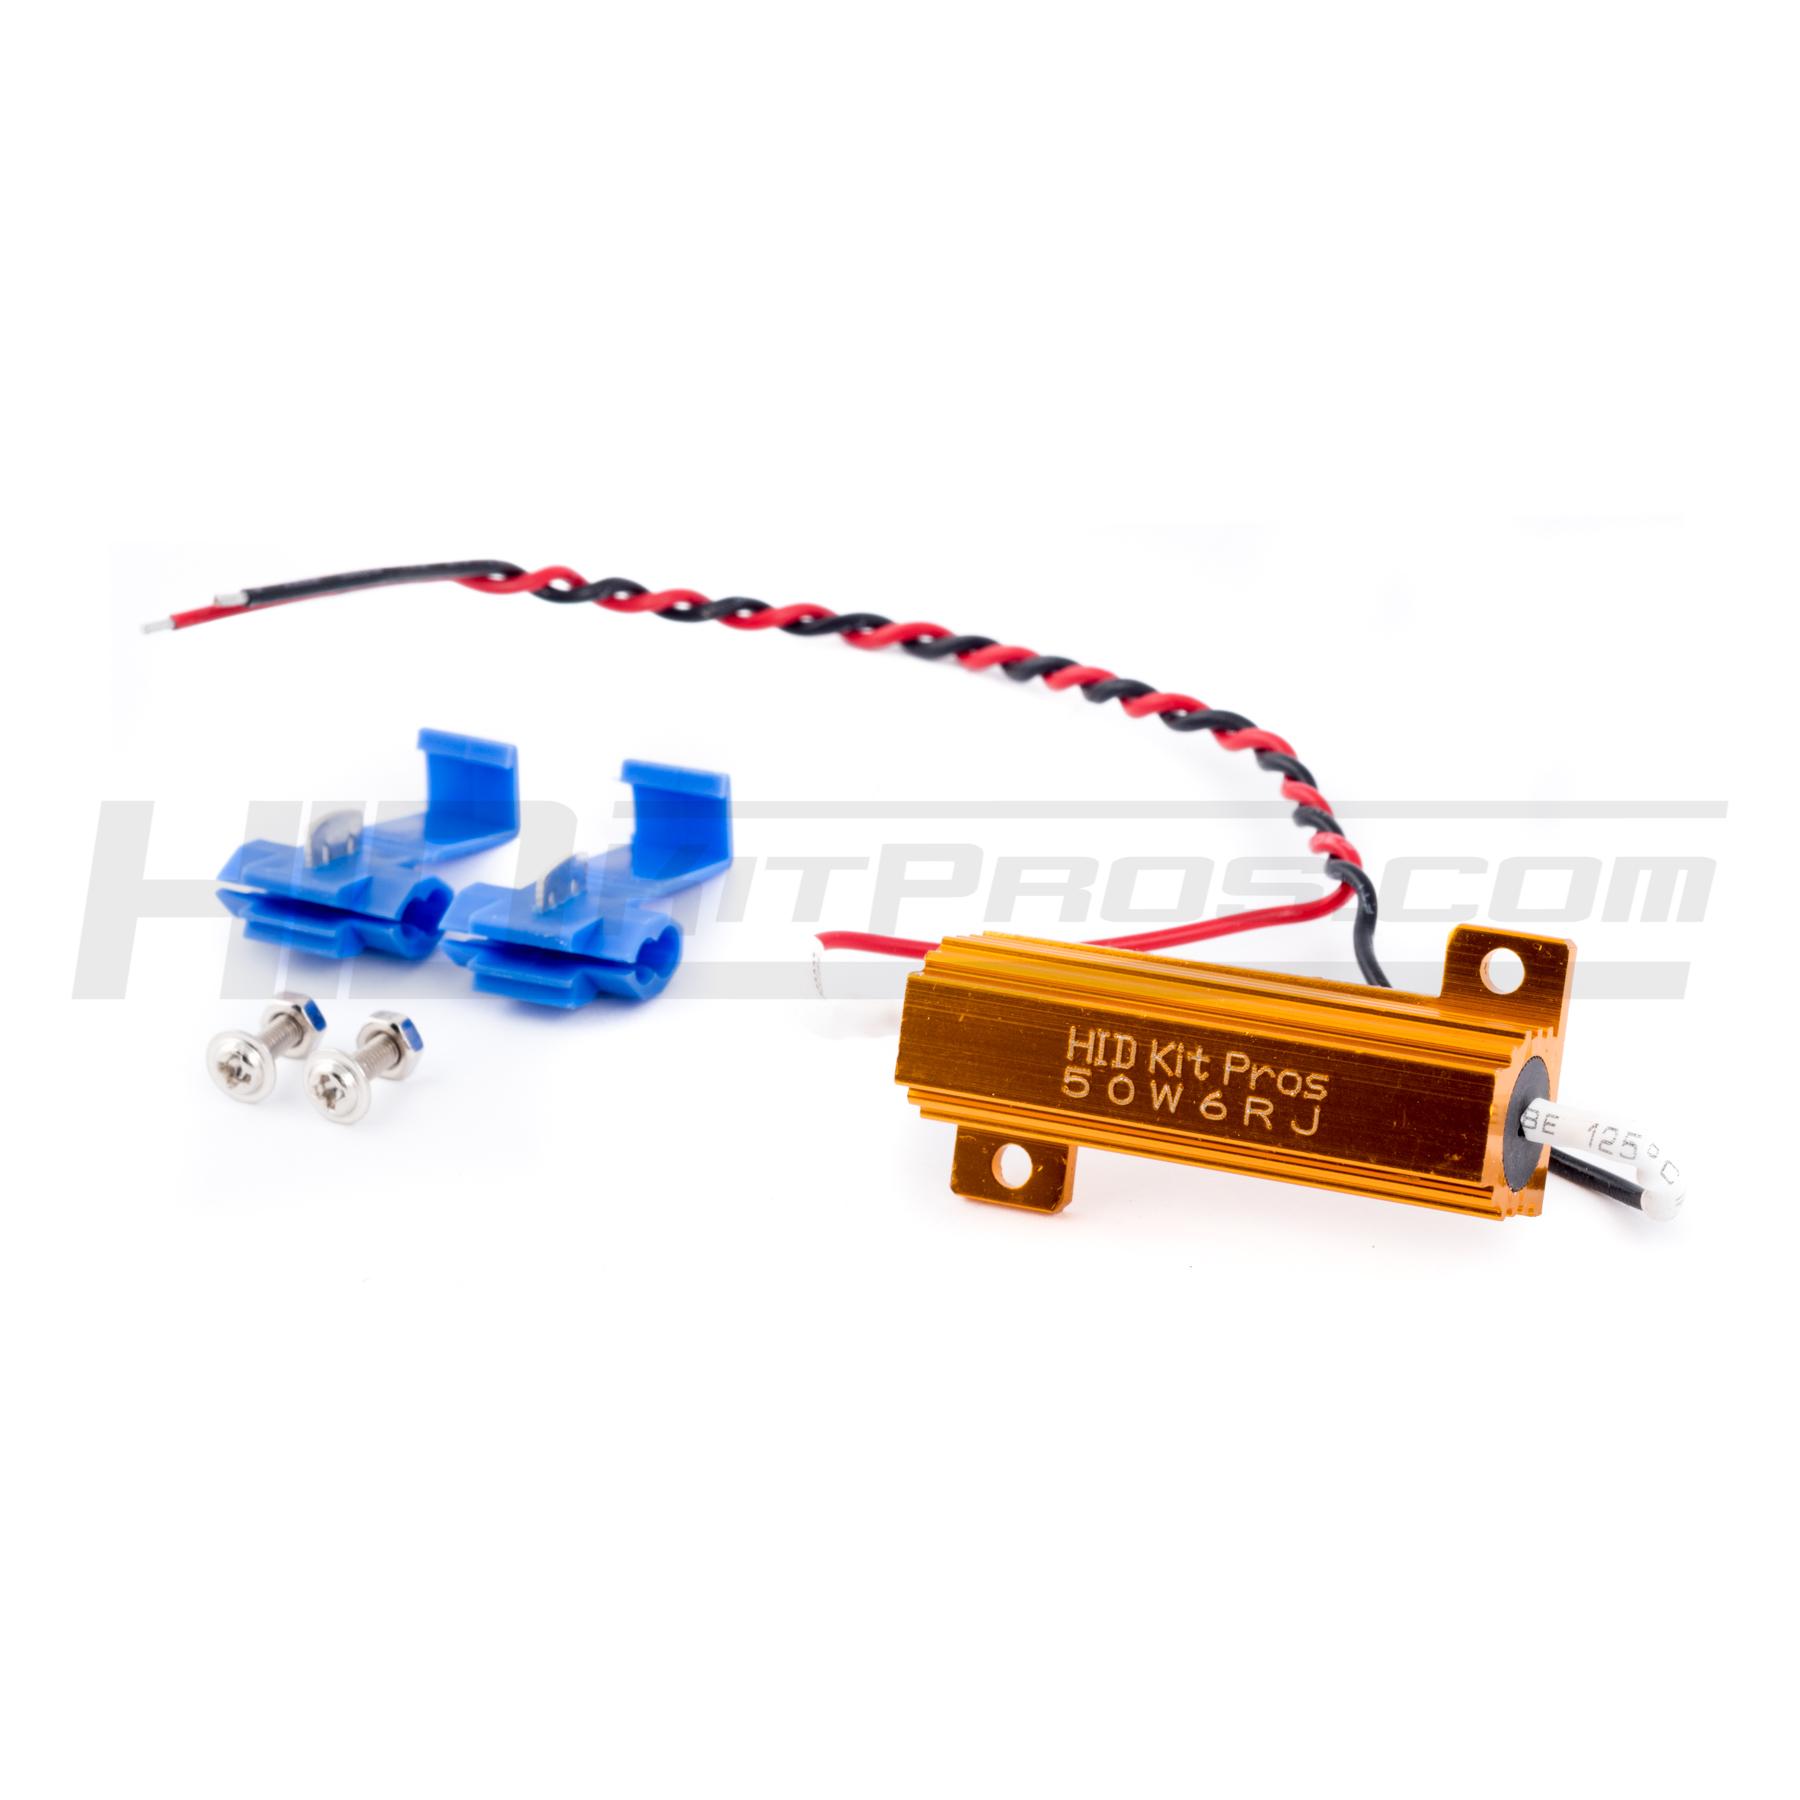 Ka24e Wiring Harness Install Library Specialties S13 Sr20det Led Hid Load Resistor Hyper Flash Fix Kit Pros Installing